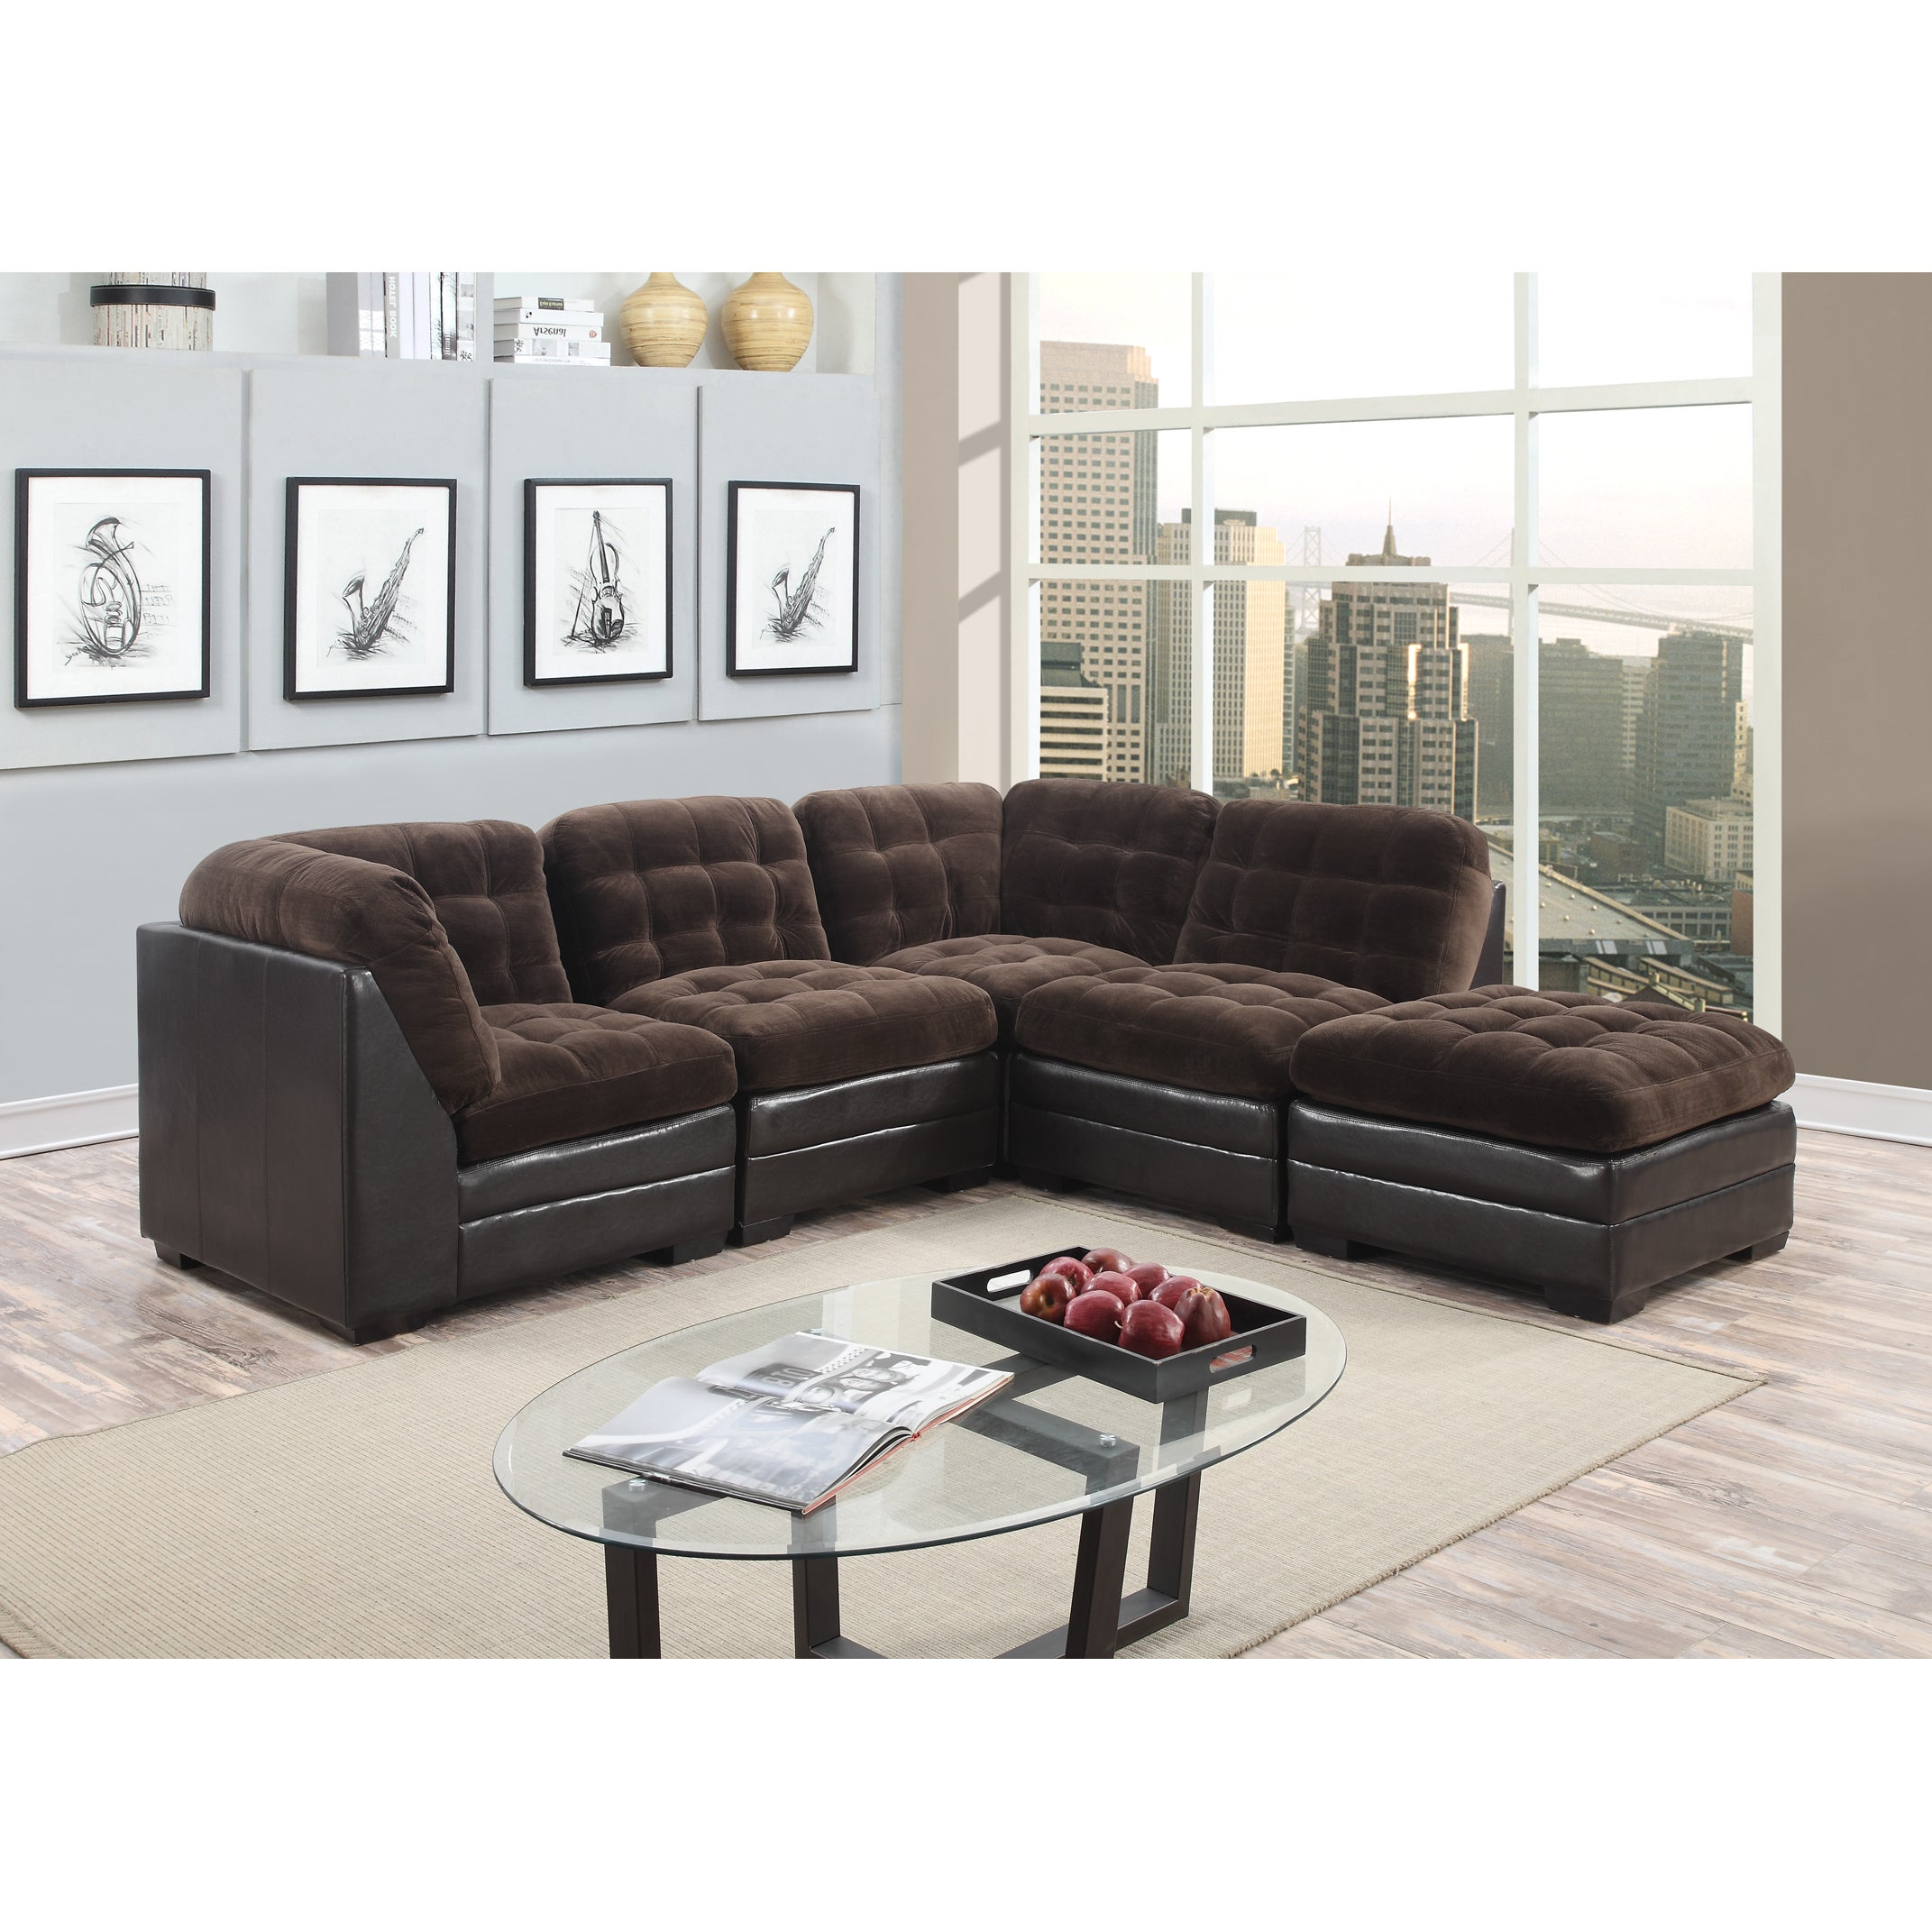 Shop Porter Reid Chocolate Brown Sectional Sofa with Optional ...